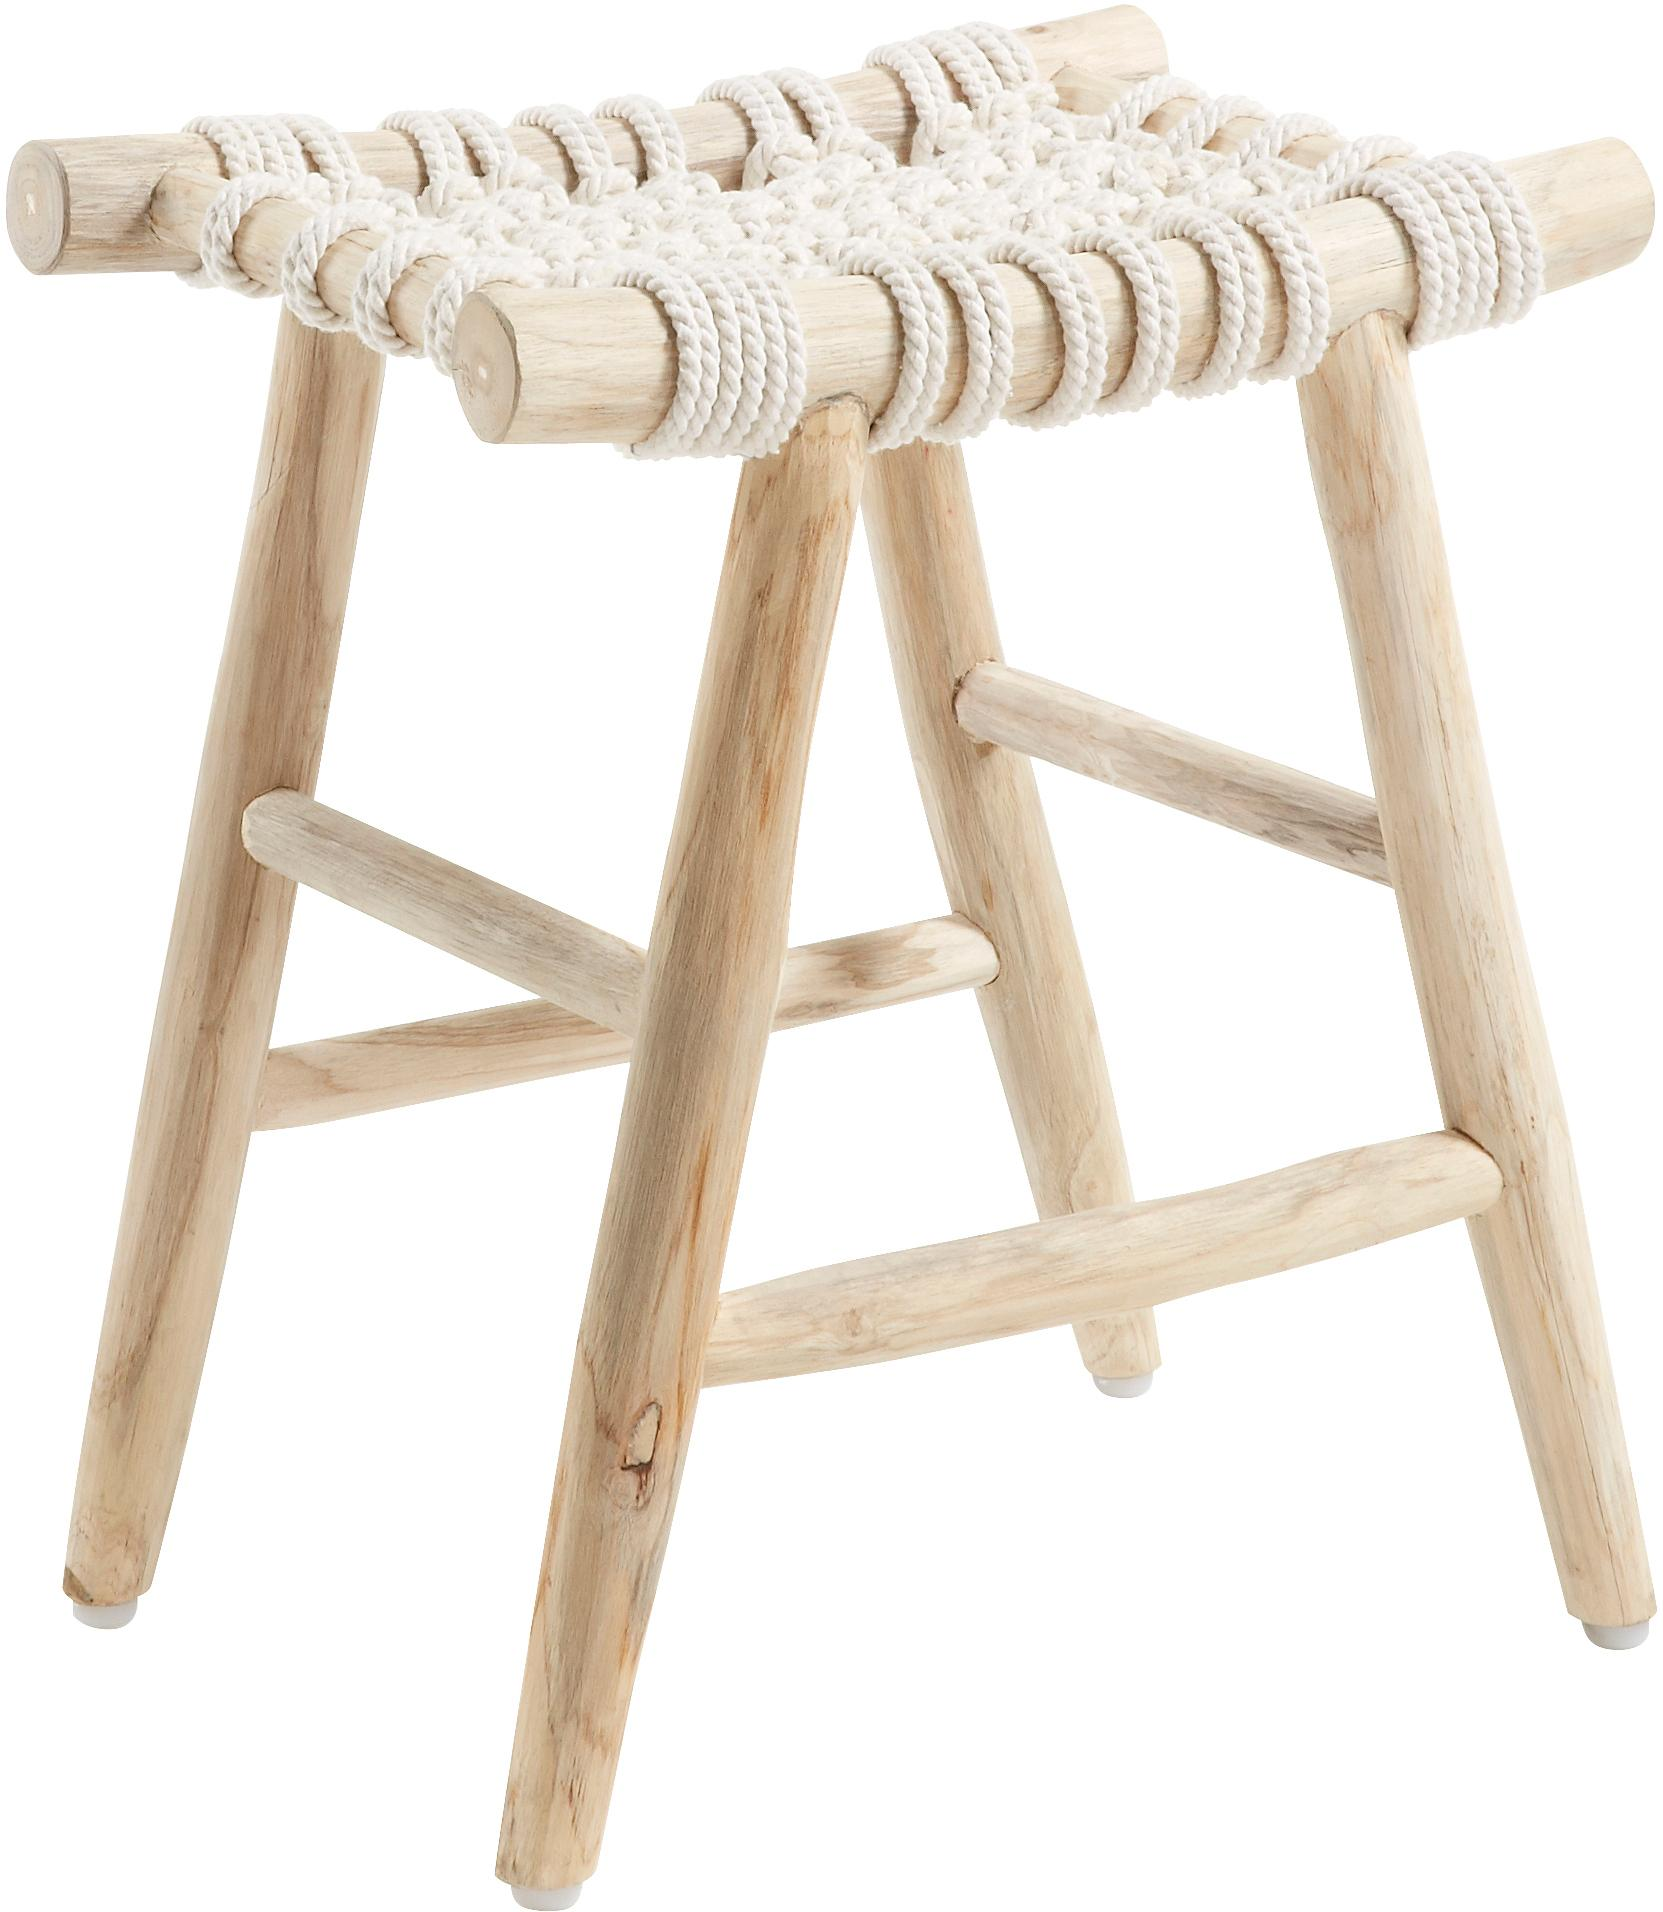 Kruk Edgard in boho stijl, Poten: teakhout, natuurlijk, Zitvlak: katoenen touw, Teakhoutkleurig, wit, B 45 cm